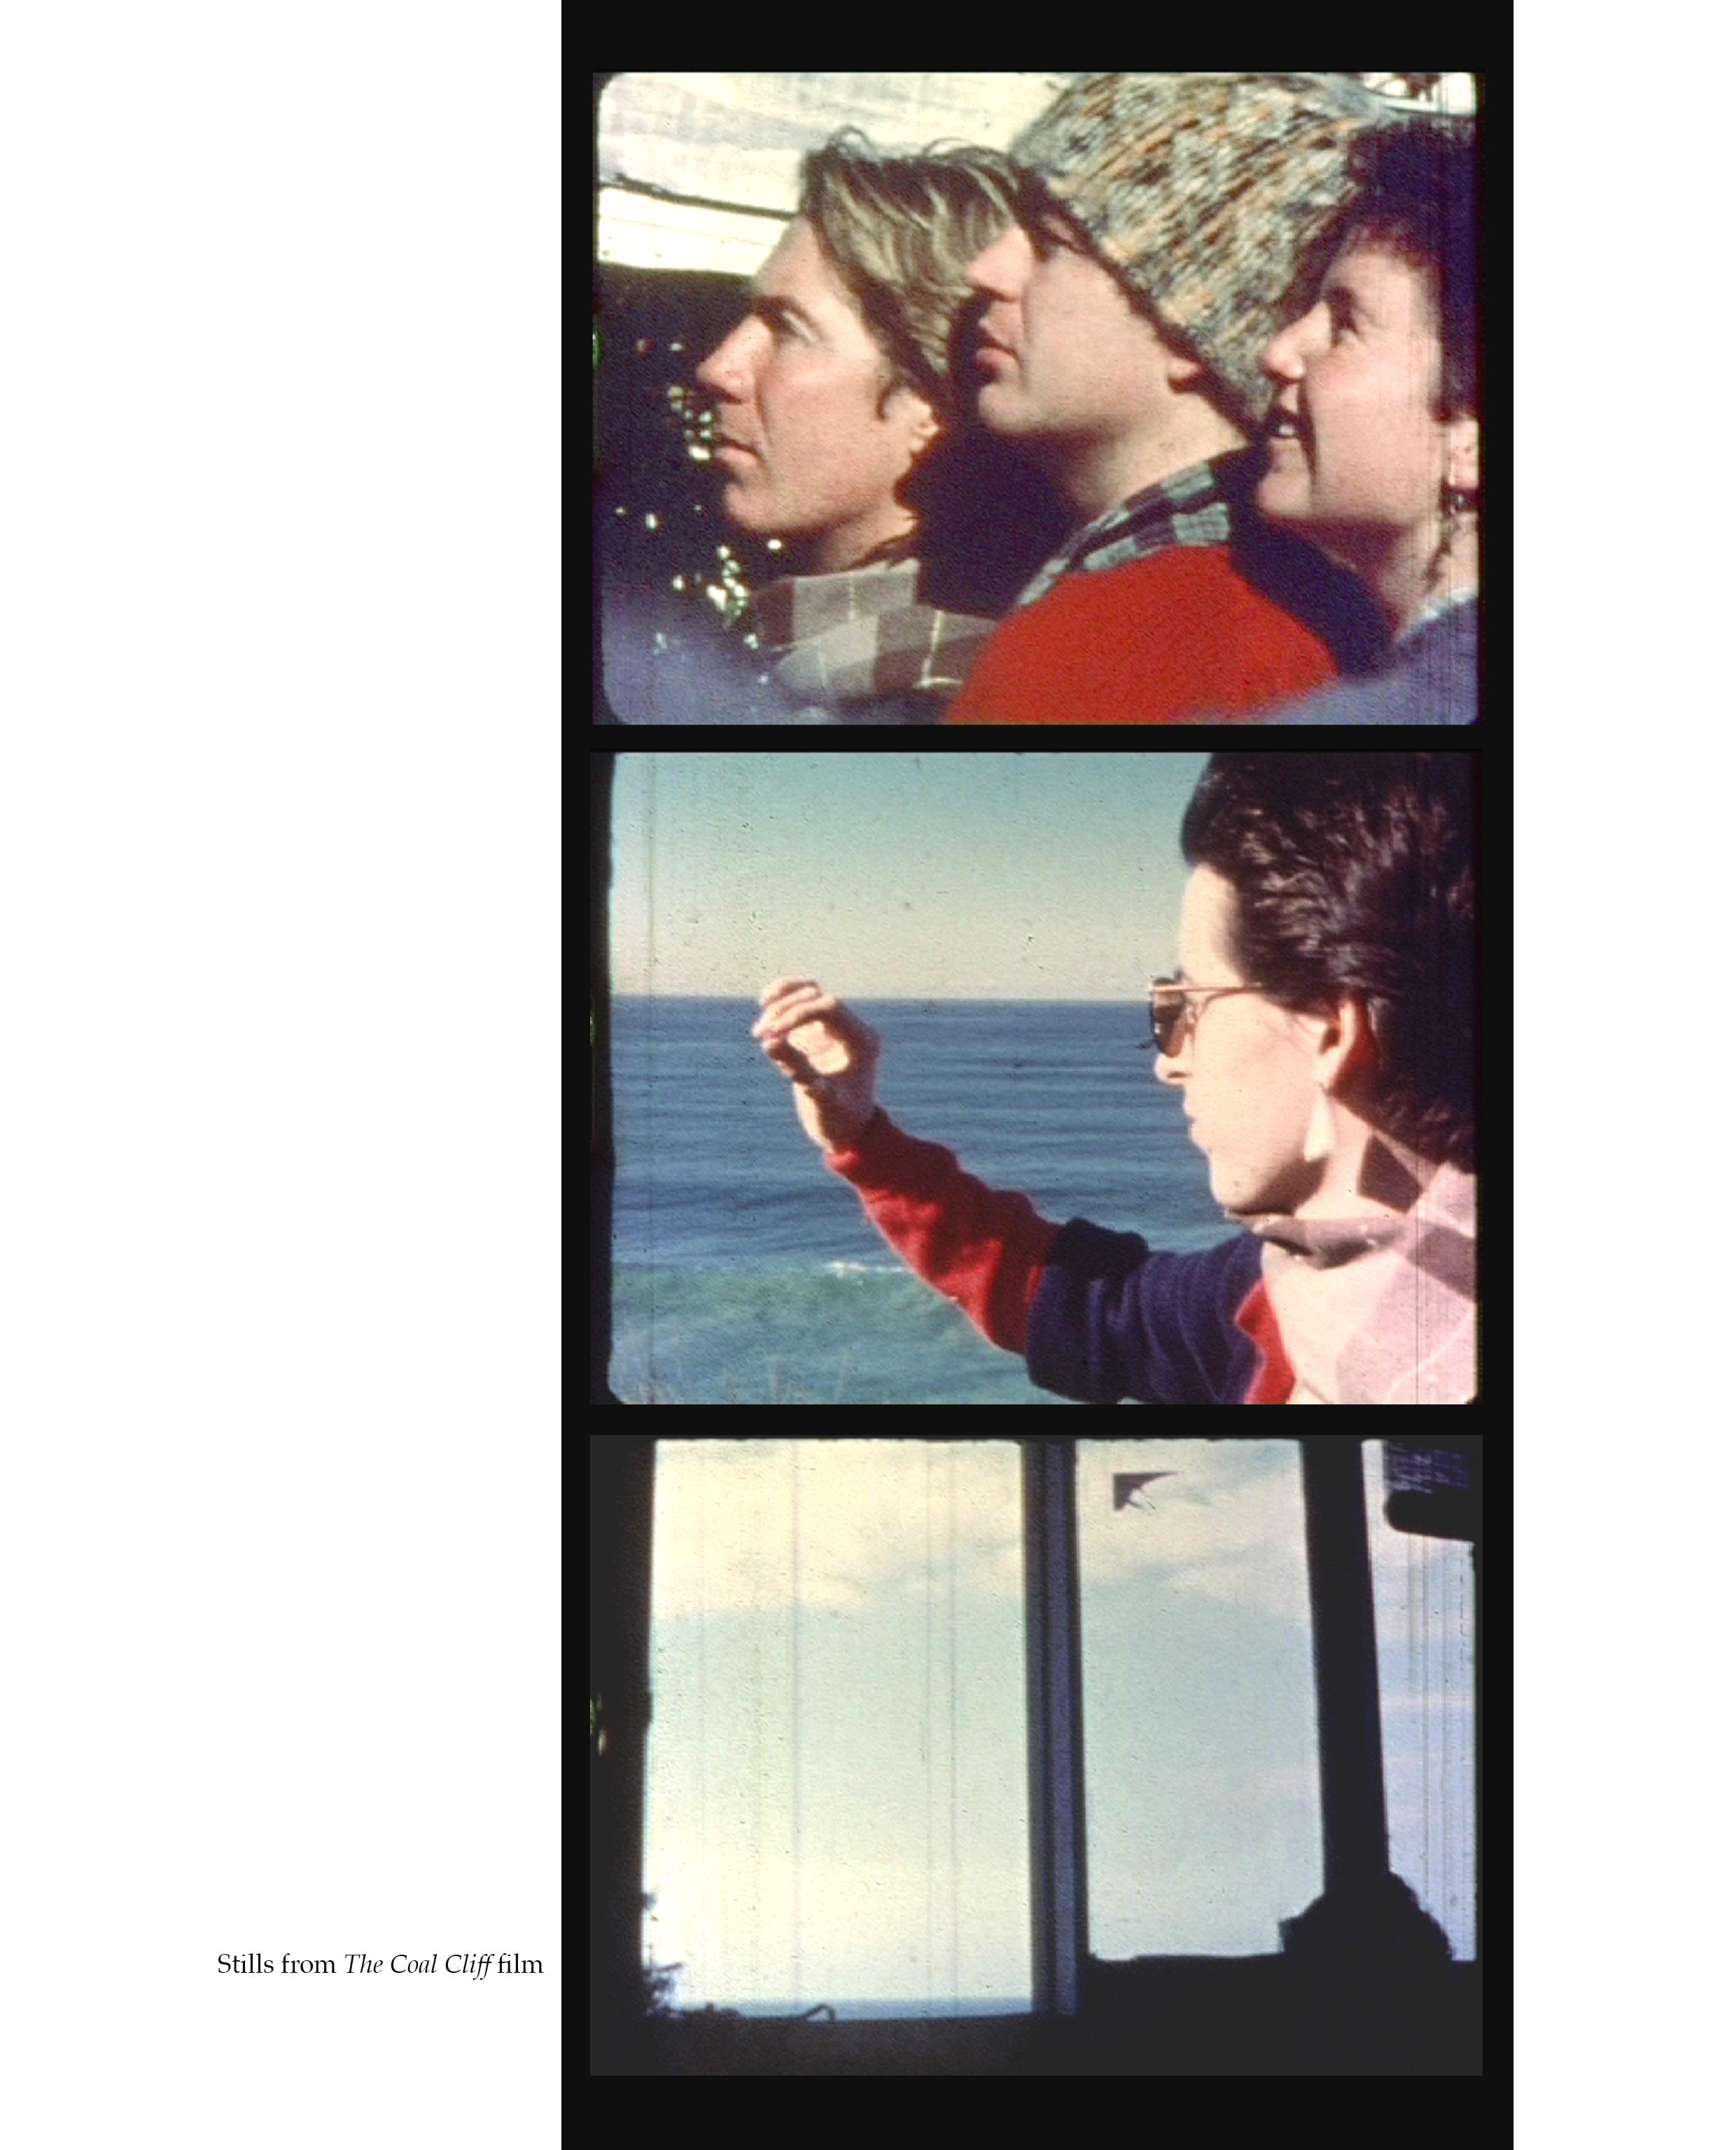 Kate Richards & Kurt Bremerton | The Coal Cliff | 1981 | Super8 | 13:30